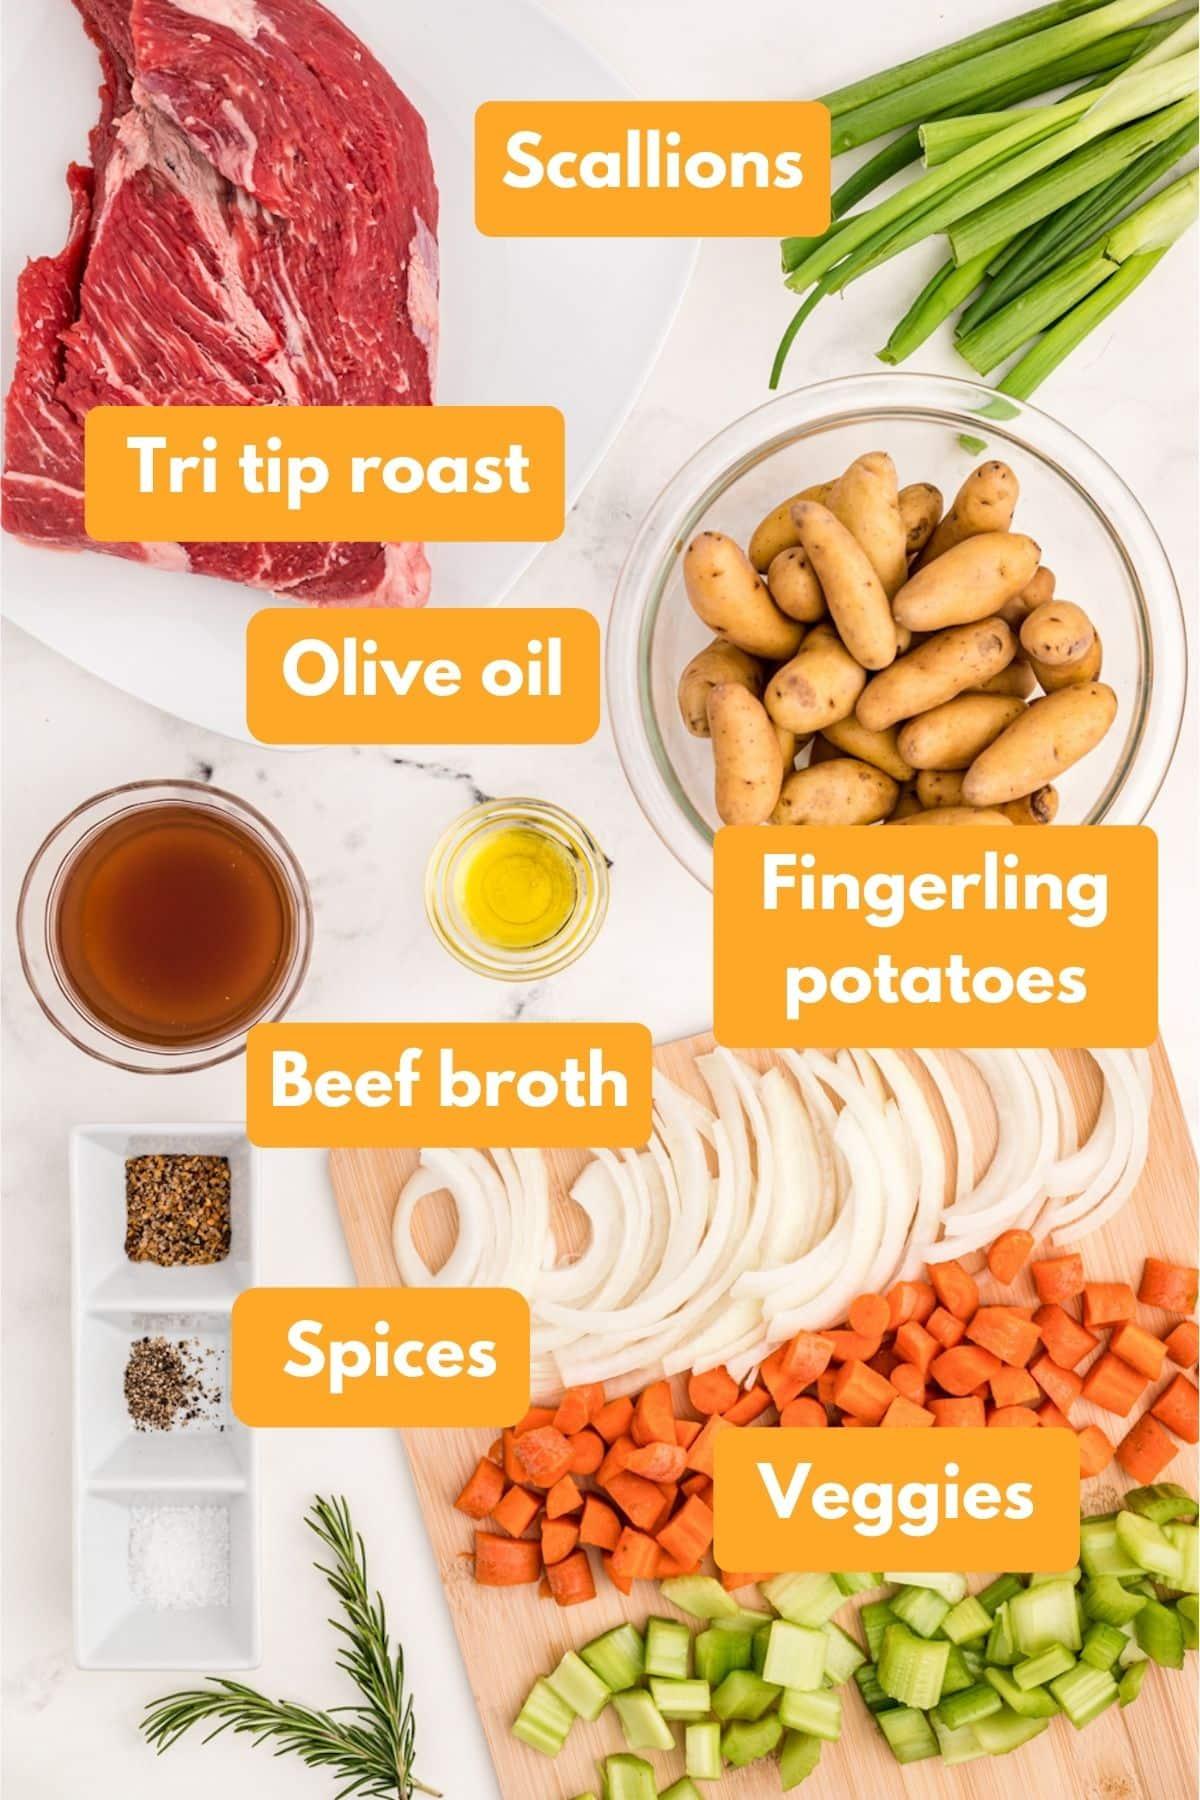 ingredients for slow cooker tri tip roast